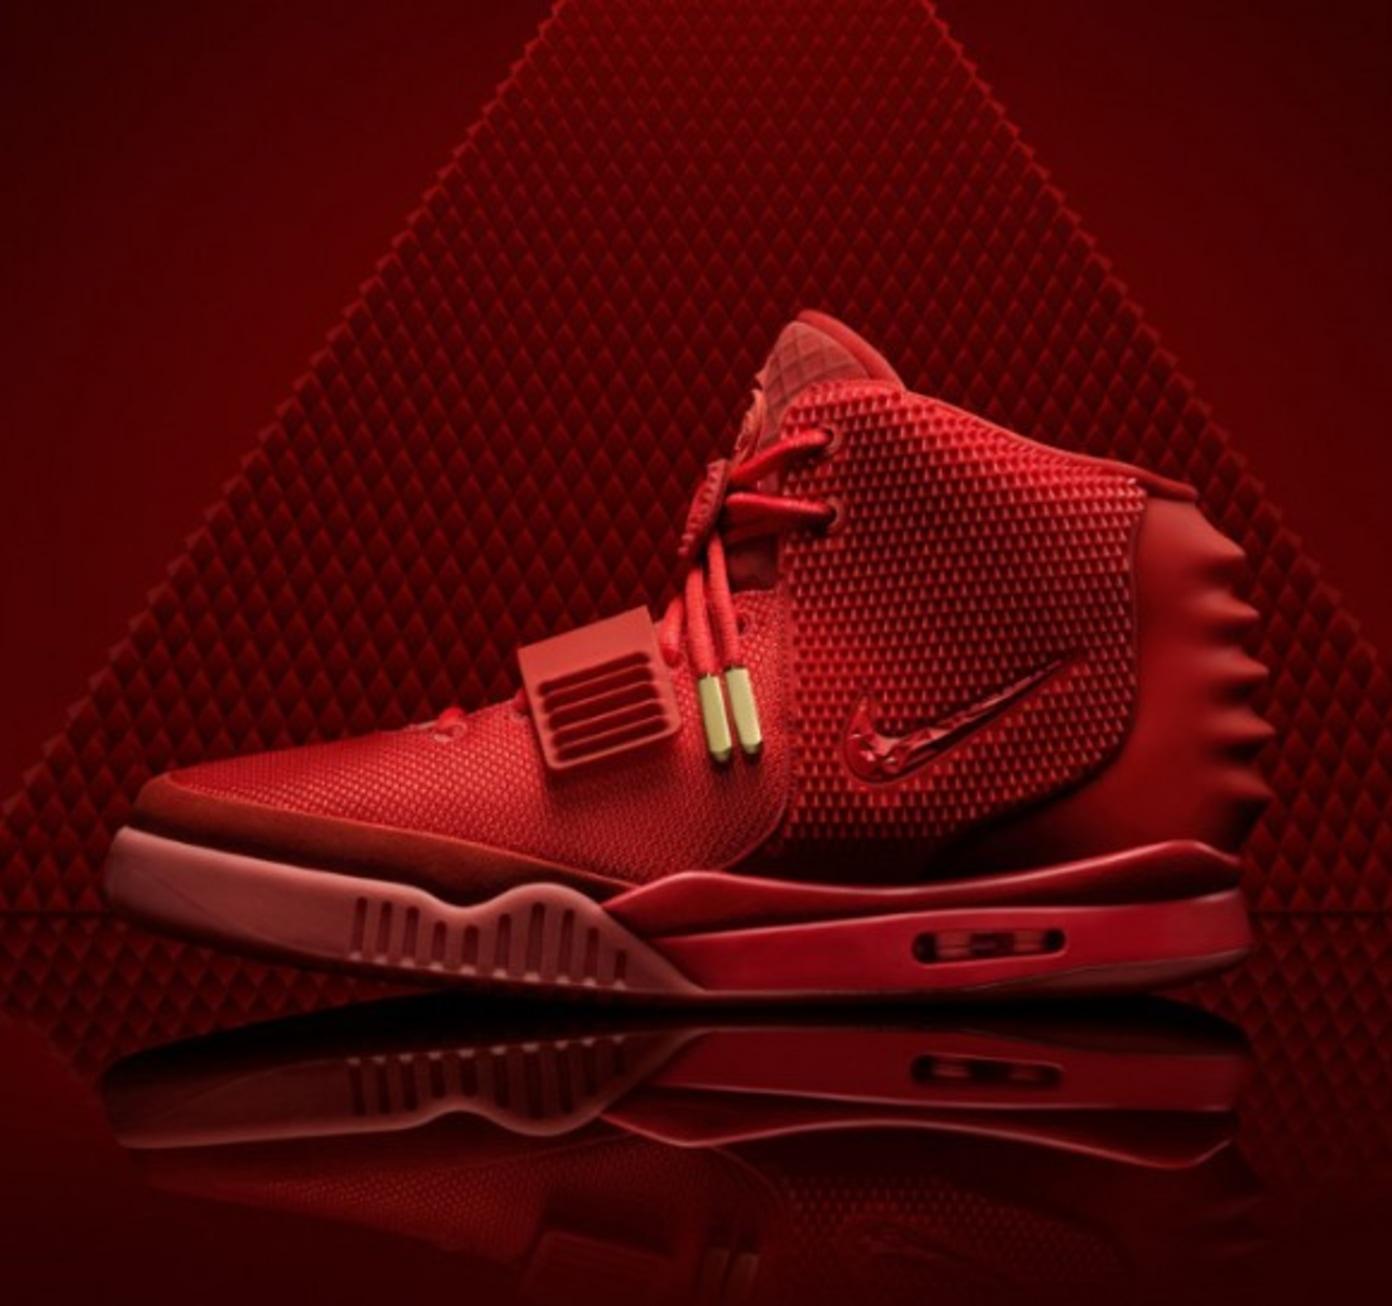 Nike Secretly Drops Air Yeezy 2 Red